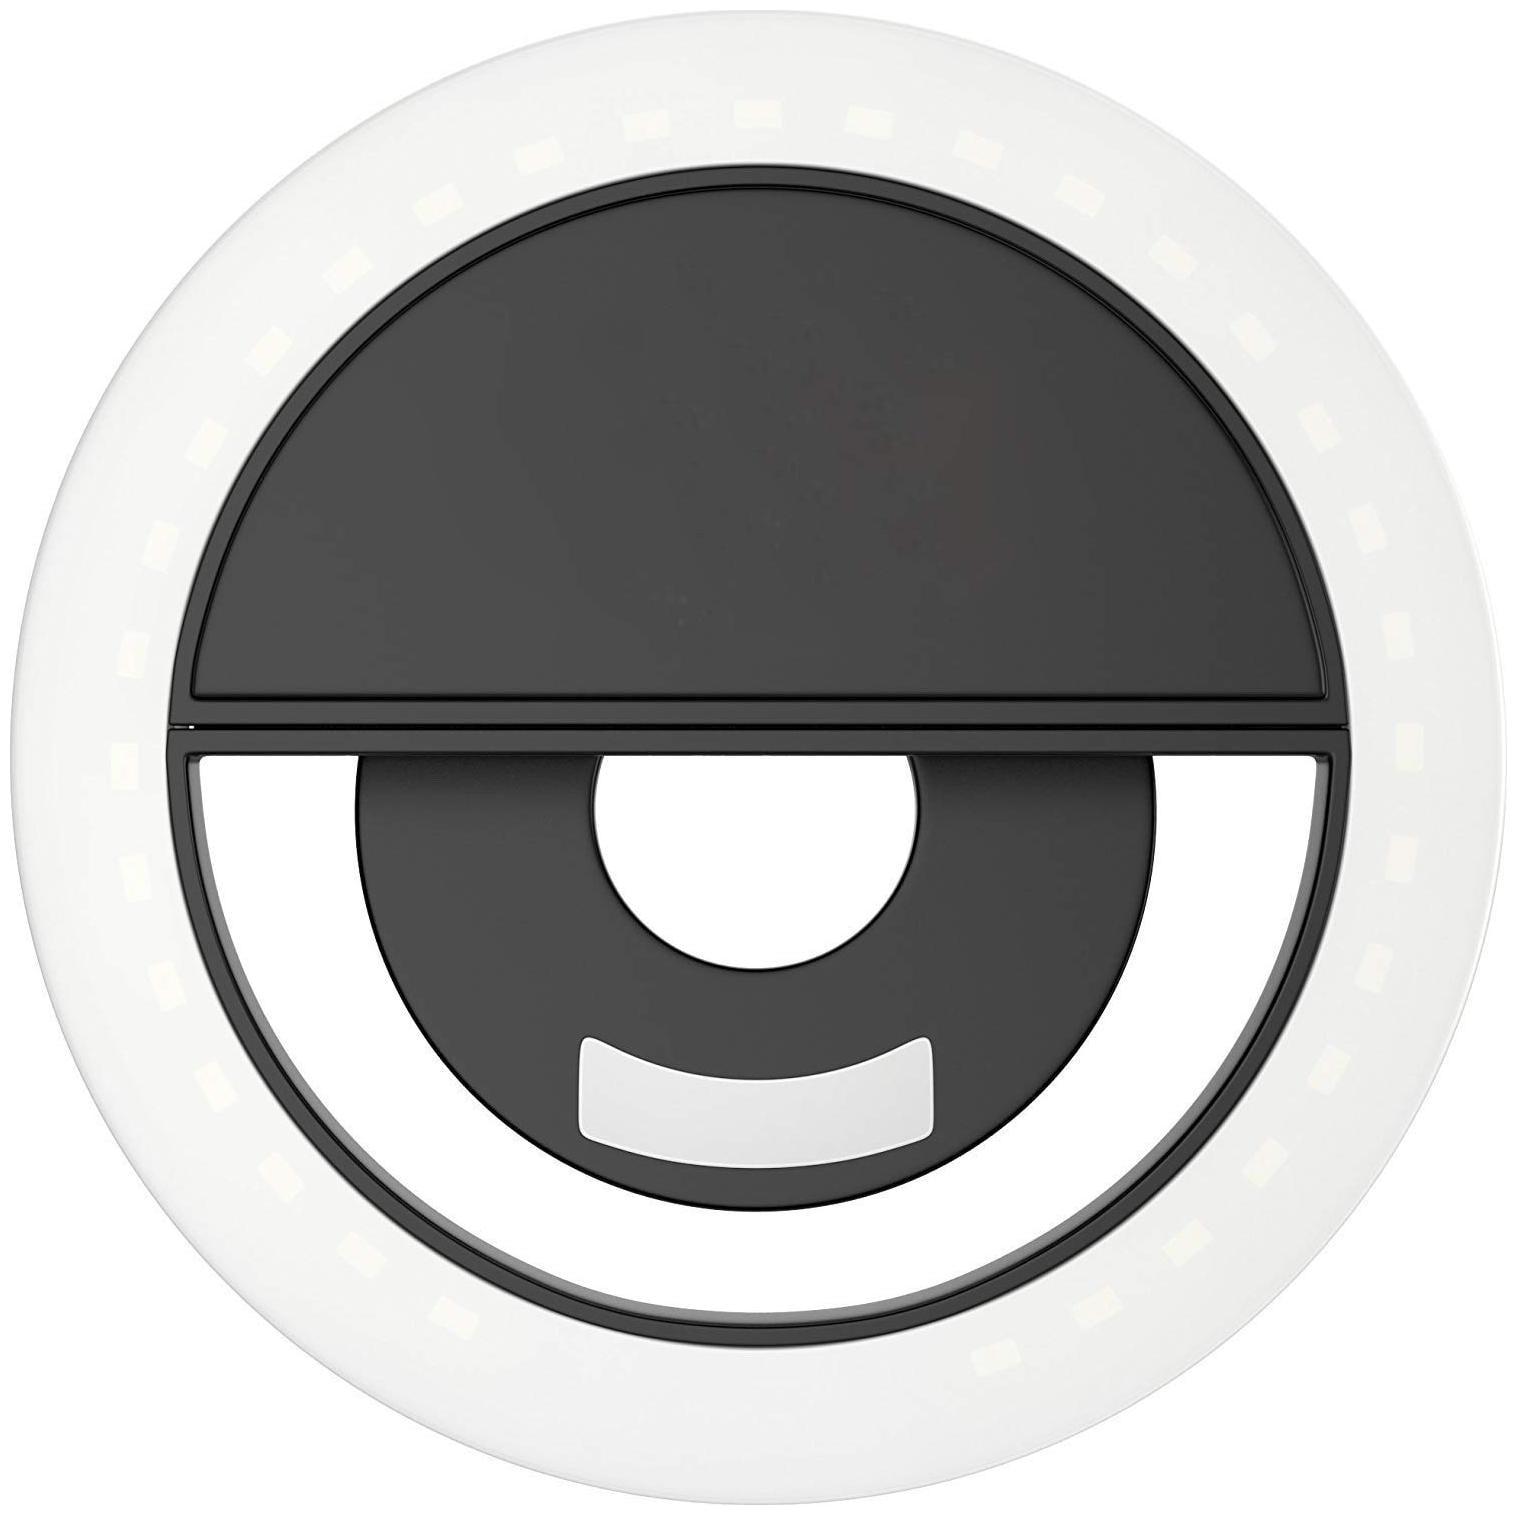 https://assetscdn1.paytm.com/images/catalog/product/M/MO/MOBCHG-LED-RINGCHIR1118184F6F0C0E6/1592075080101_1..JPEG